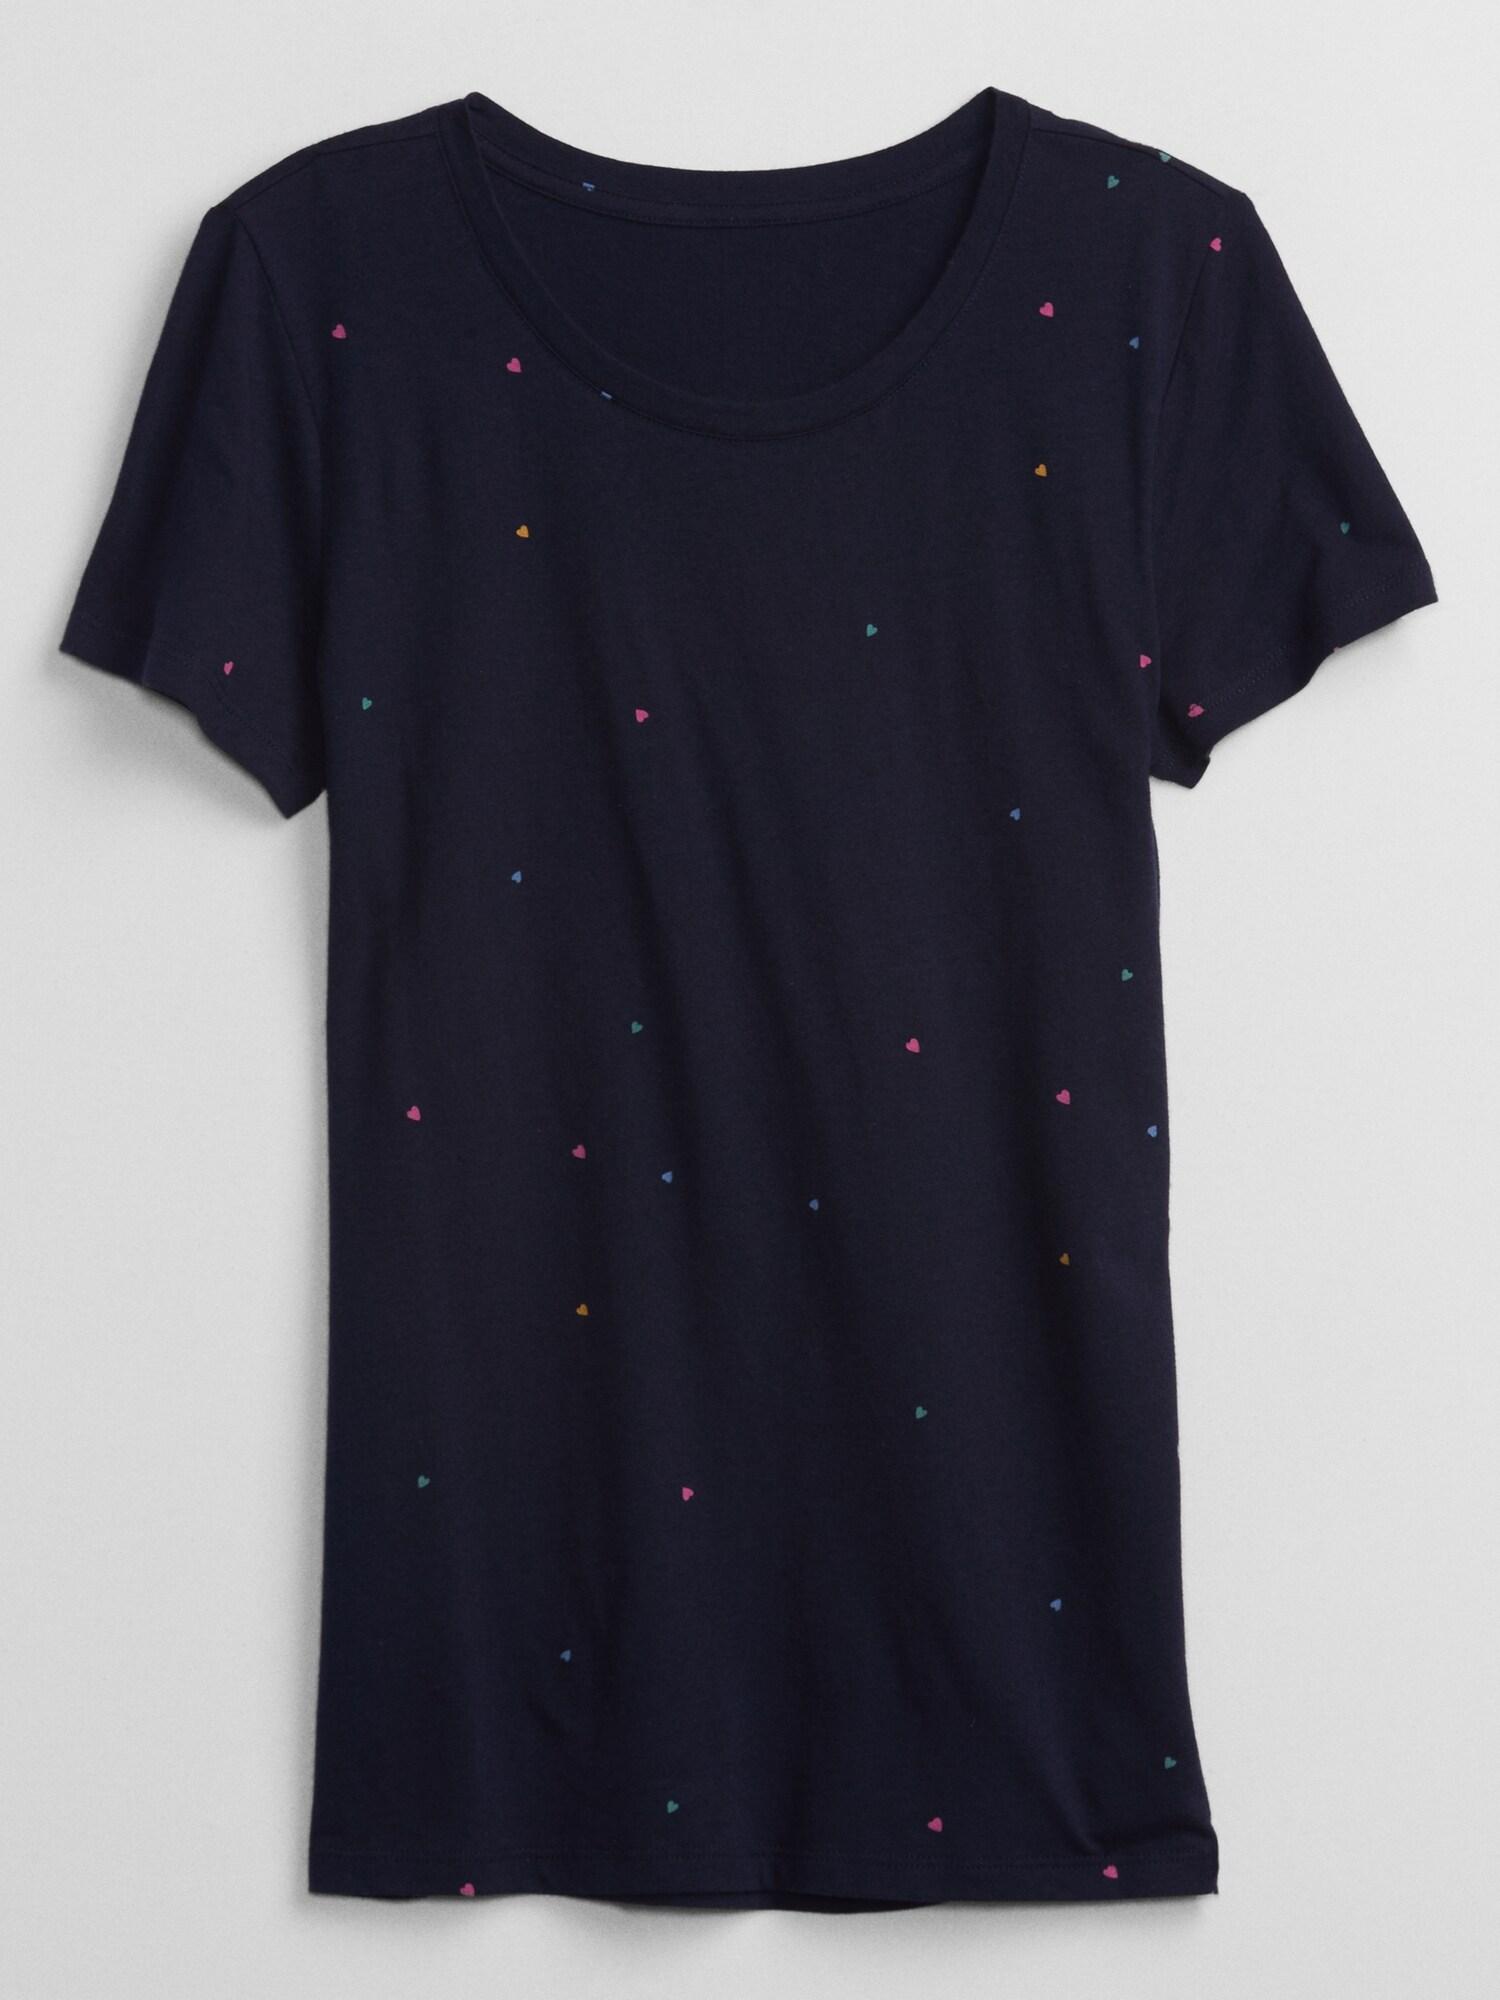 GAP Koszulki, topy damskie niebieski  Favorite